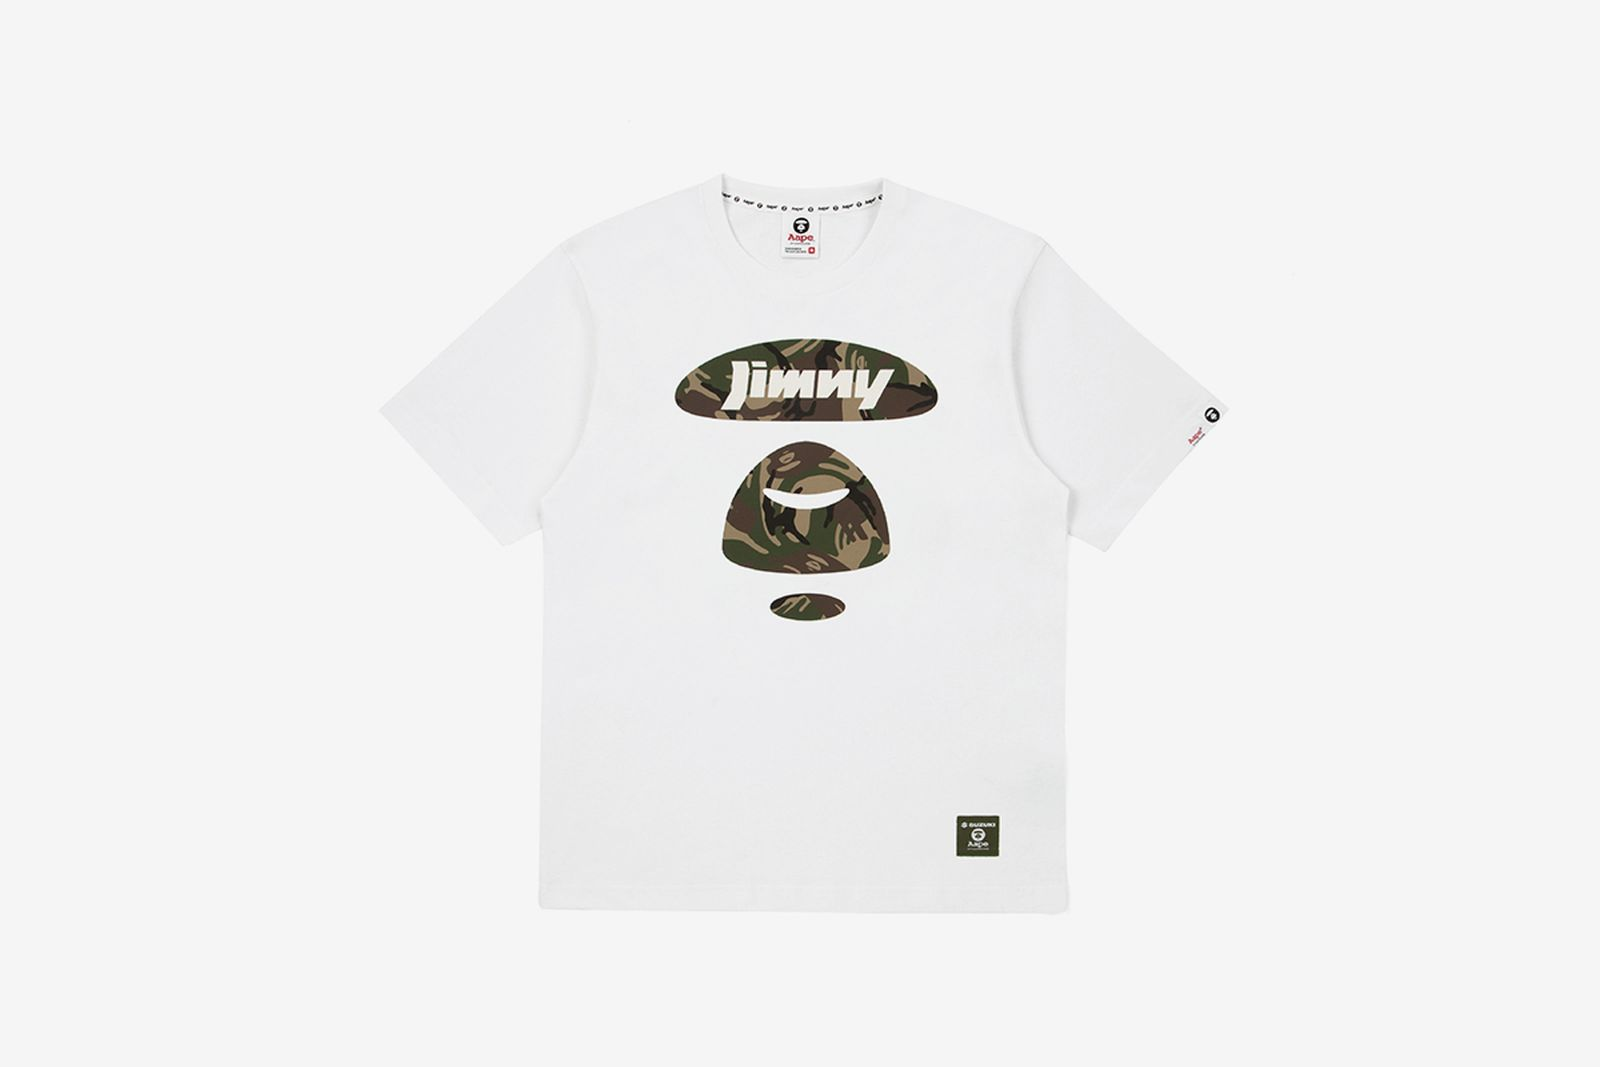 Print Suzuki Jimny aape bape